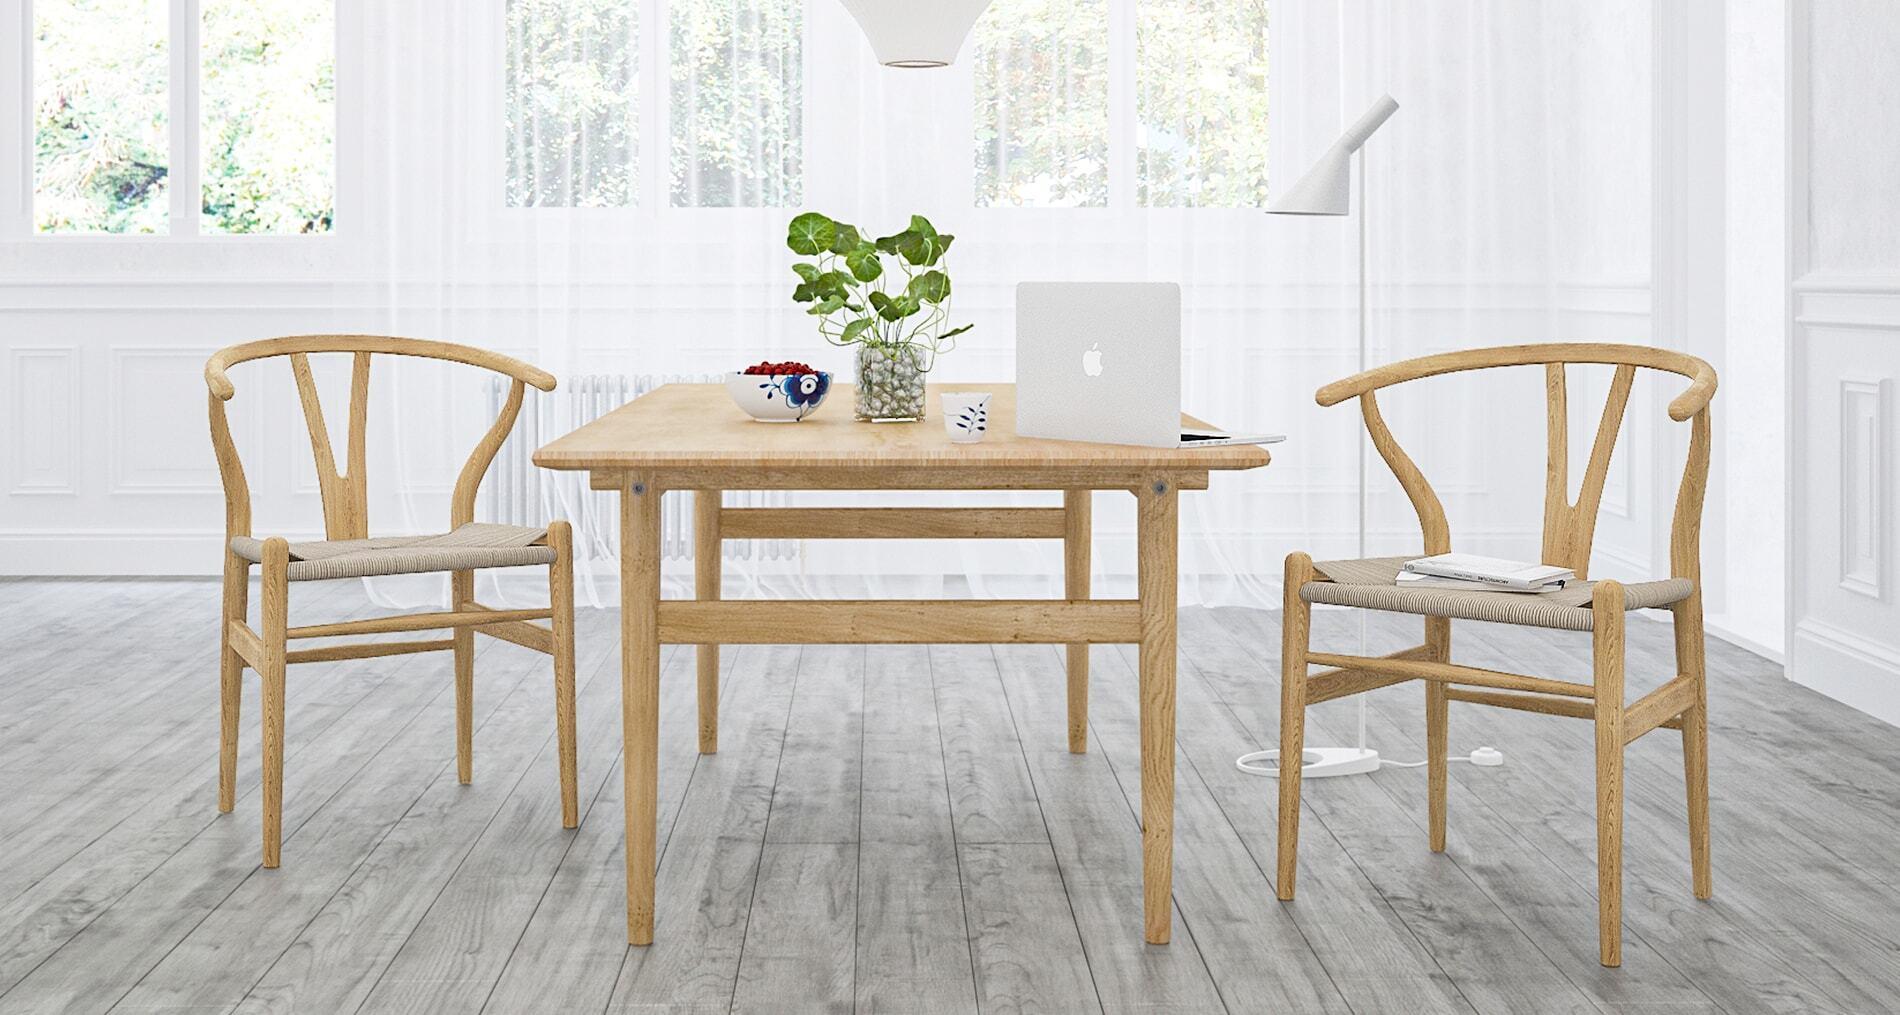 great wishbone chair in interior design